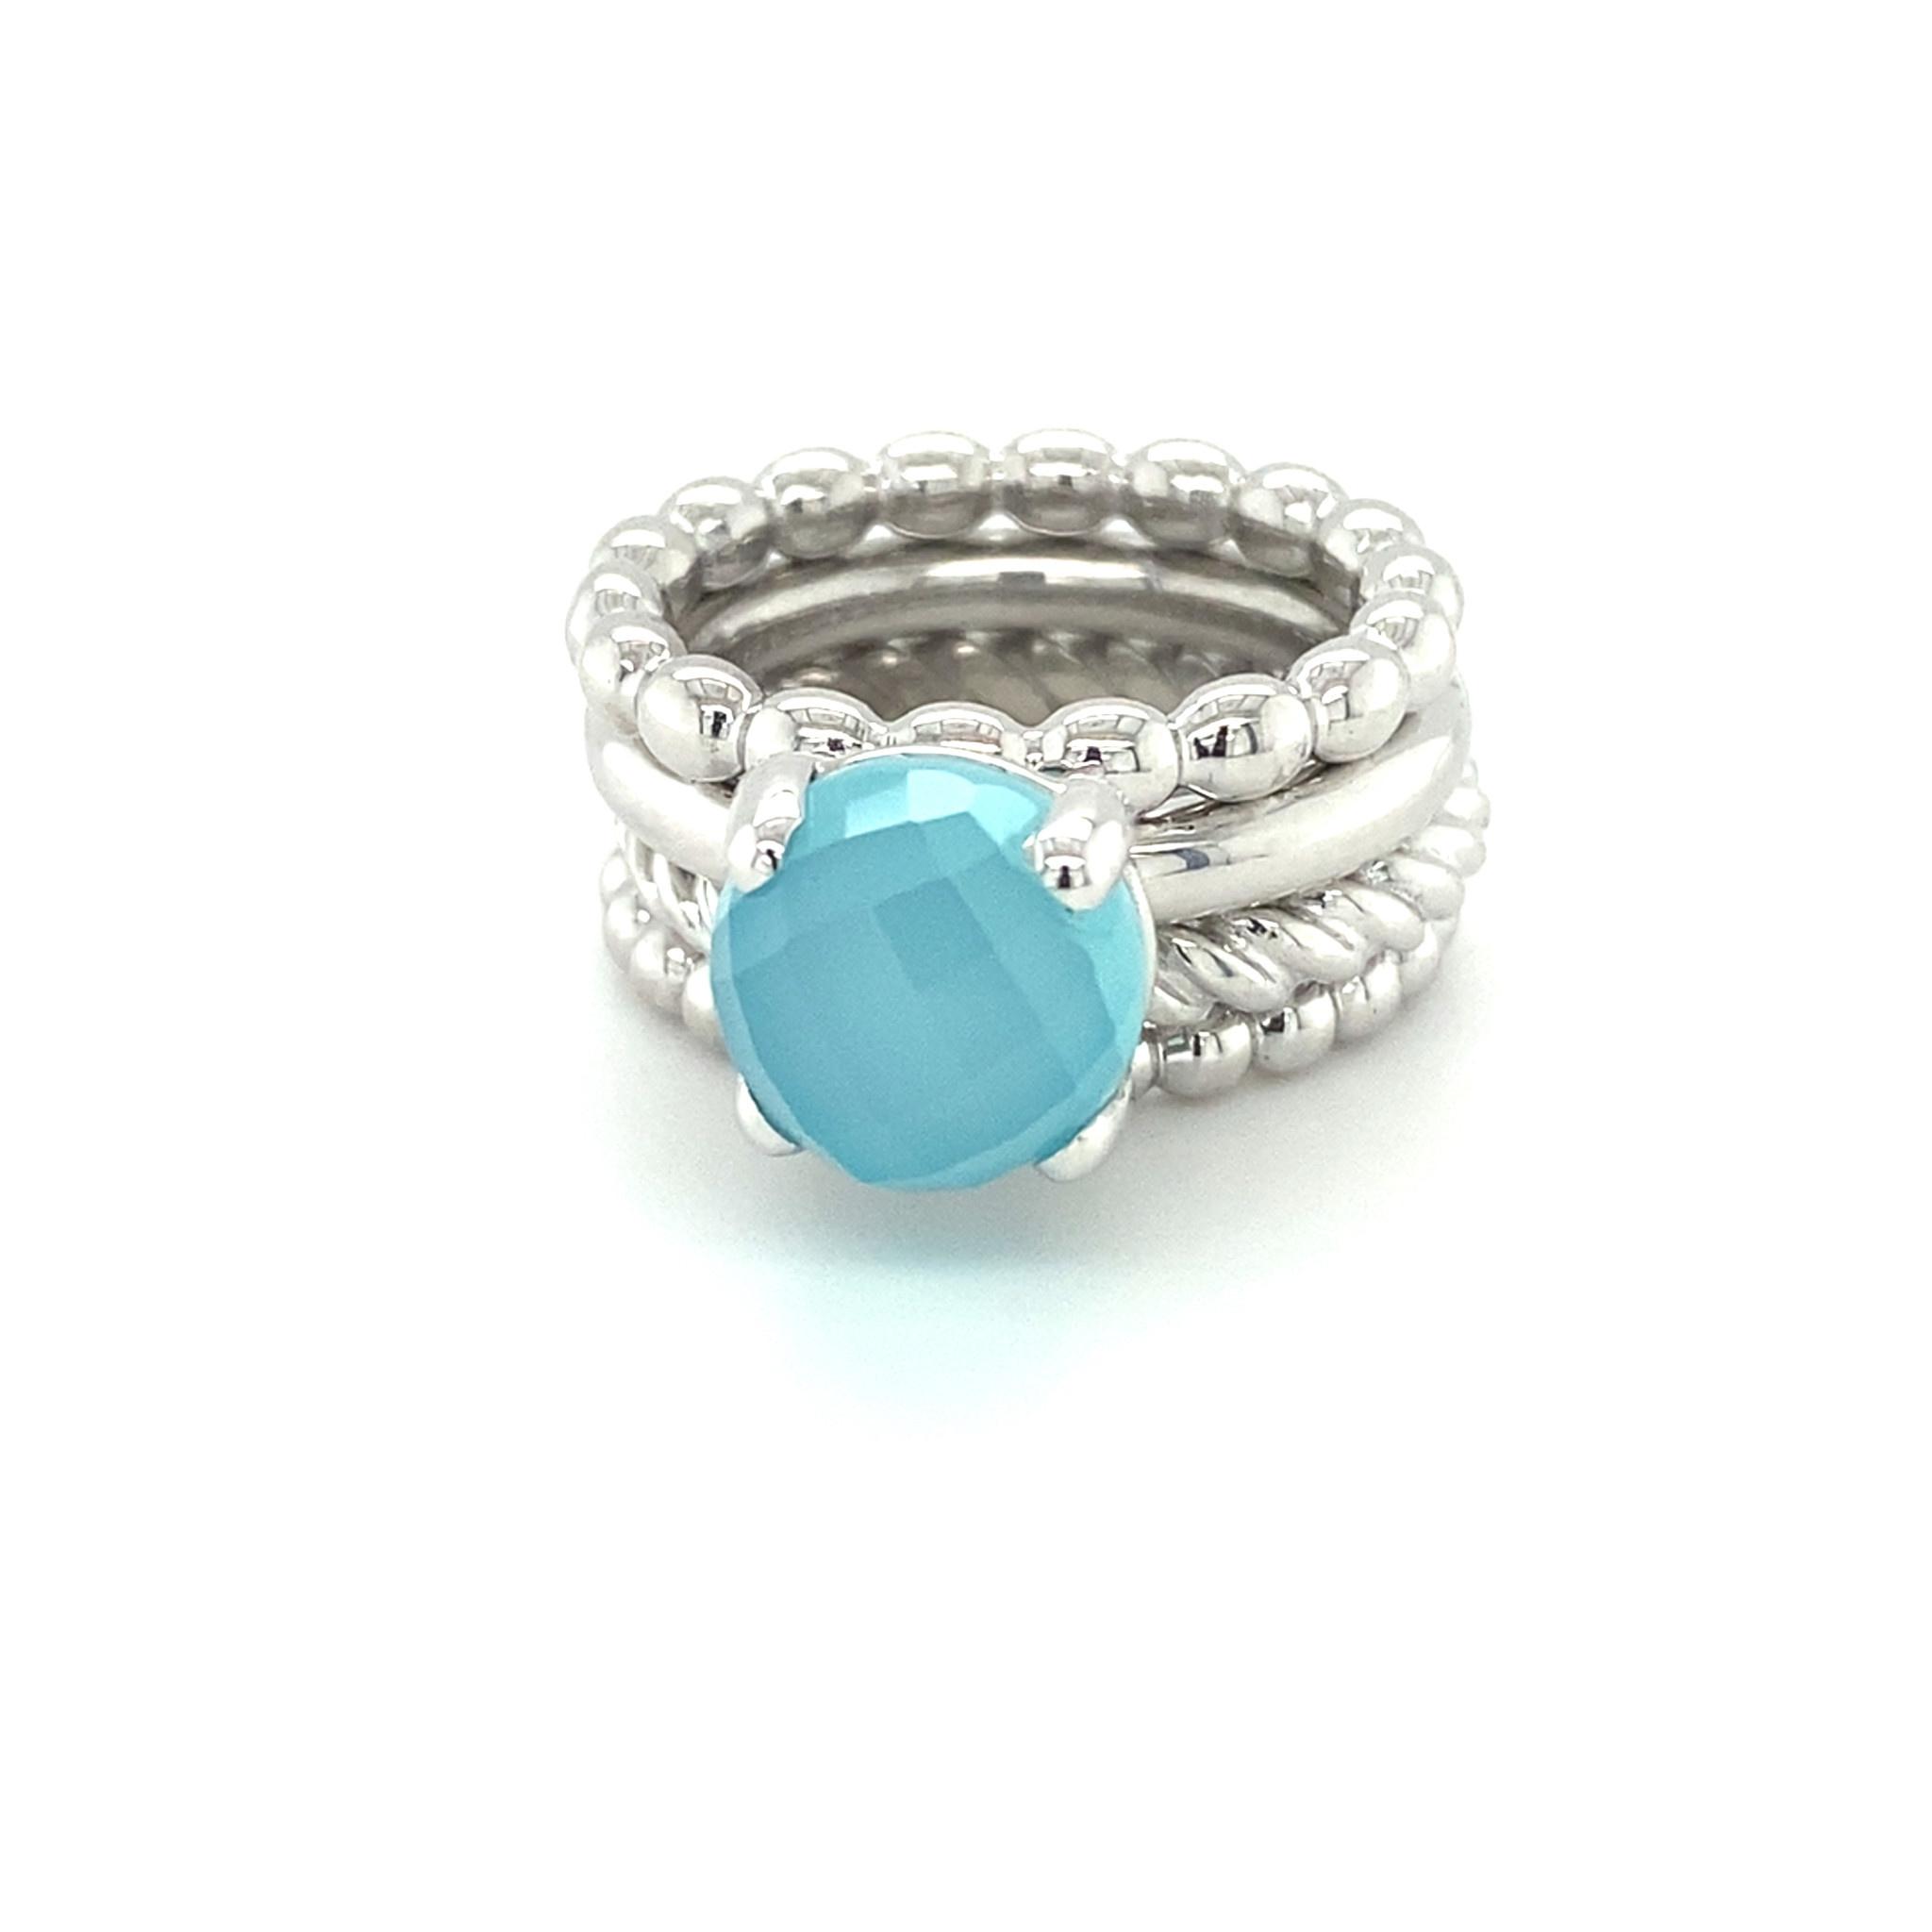 ROEMER by Bregje ROEMER by Bregje witgouden ring met blauwe chalcedoon